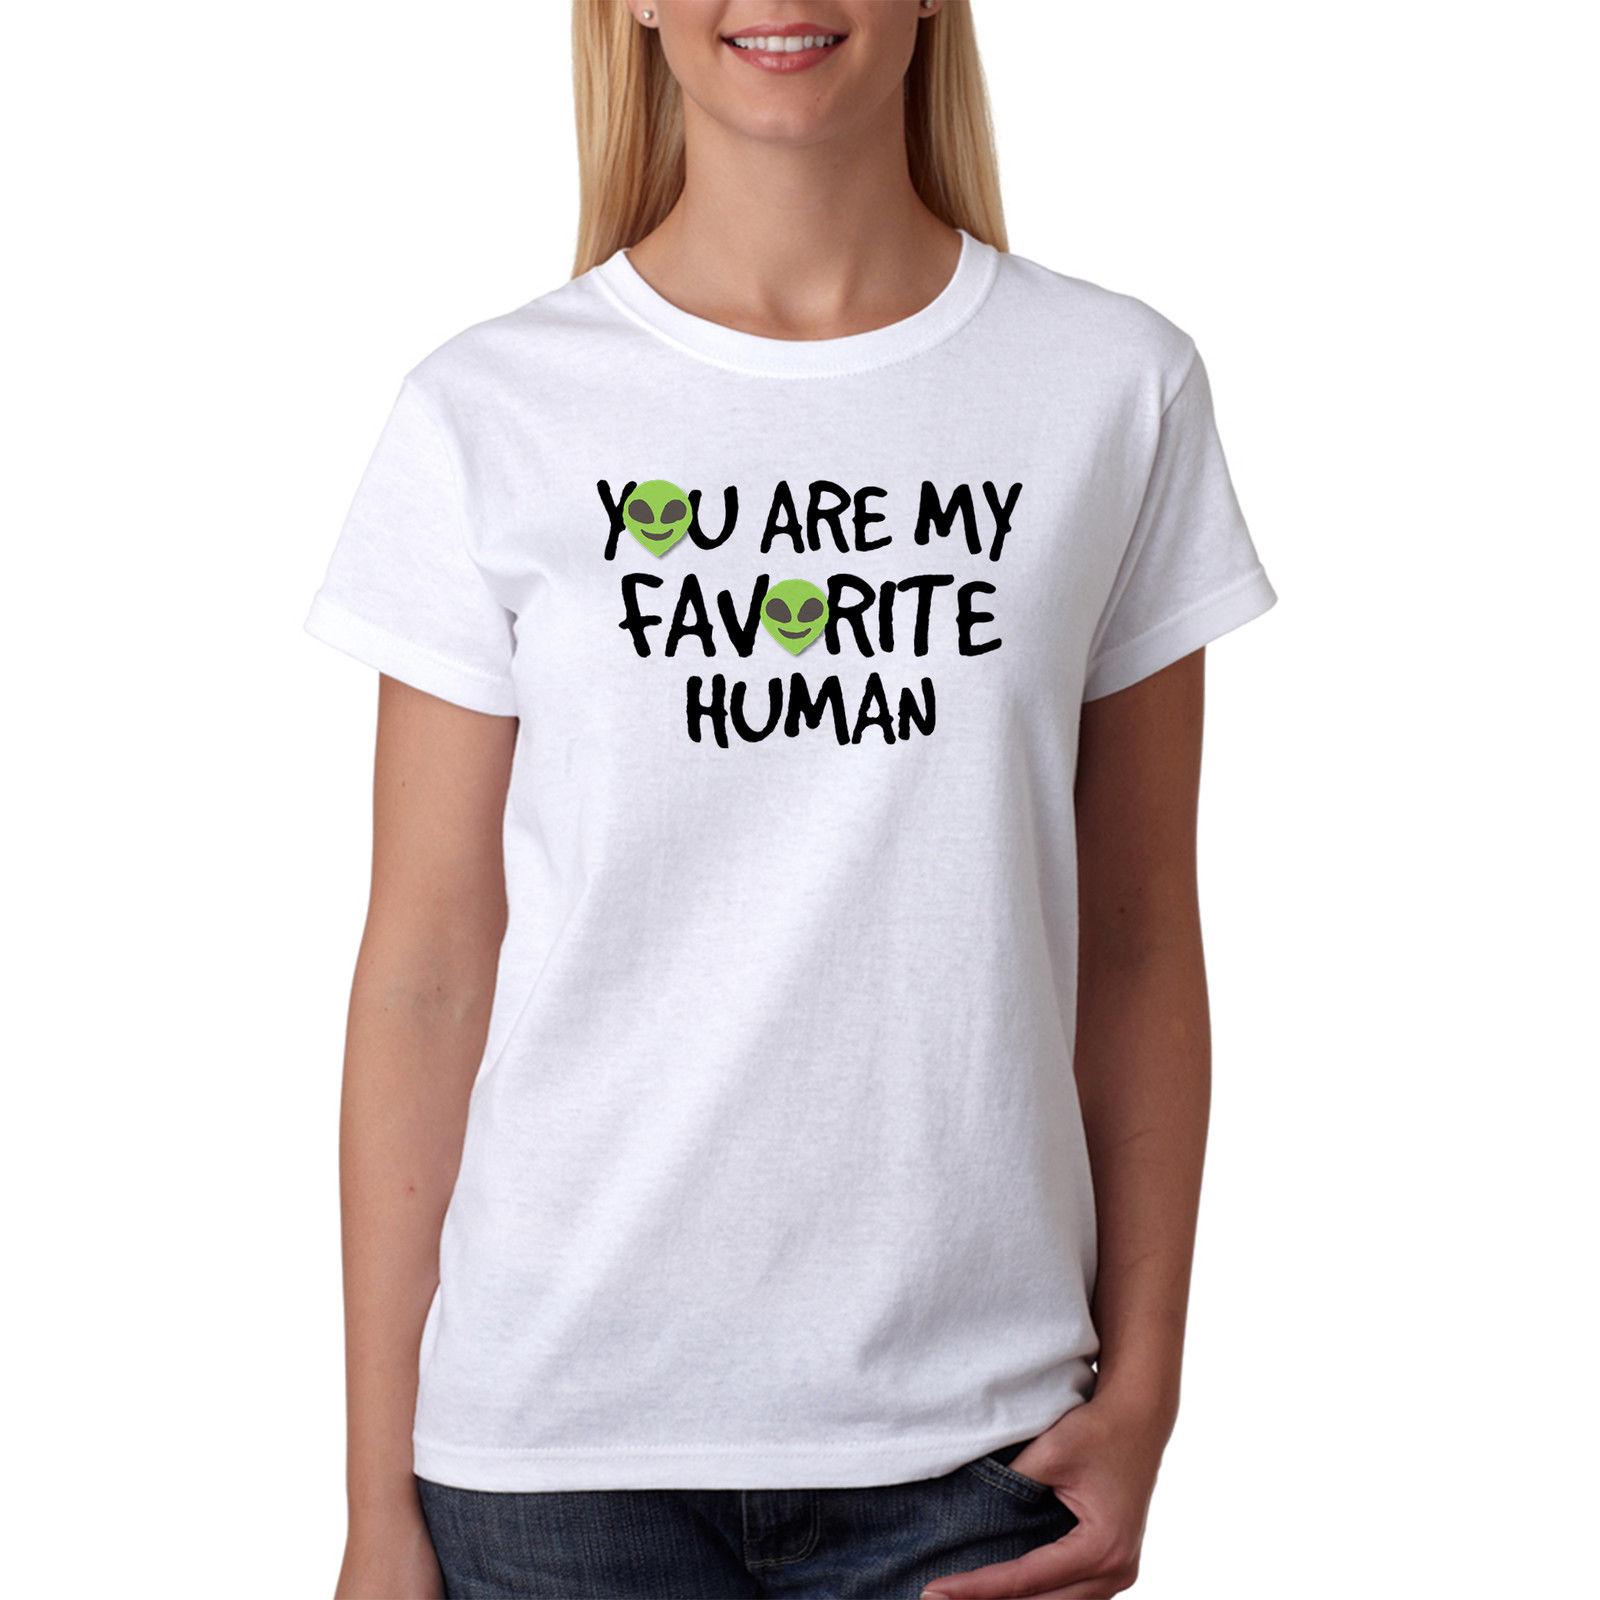 Human design t shirt - You Are My Favorite Human Emojis Women S White T Shirt New Sizes S Xl